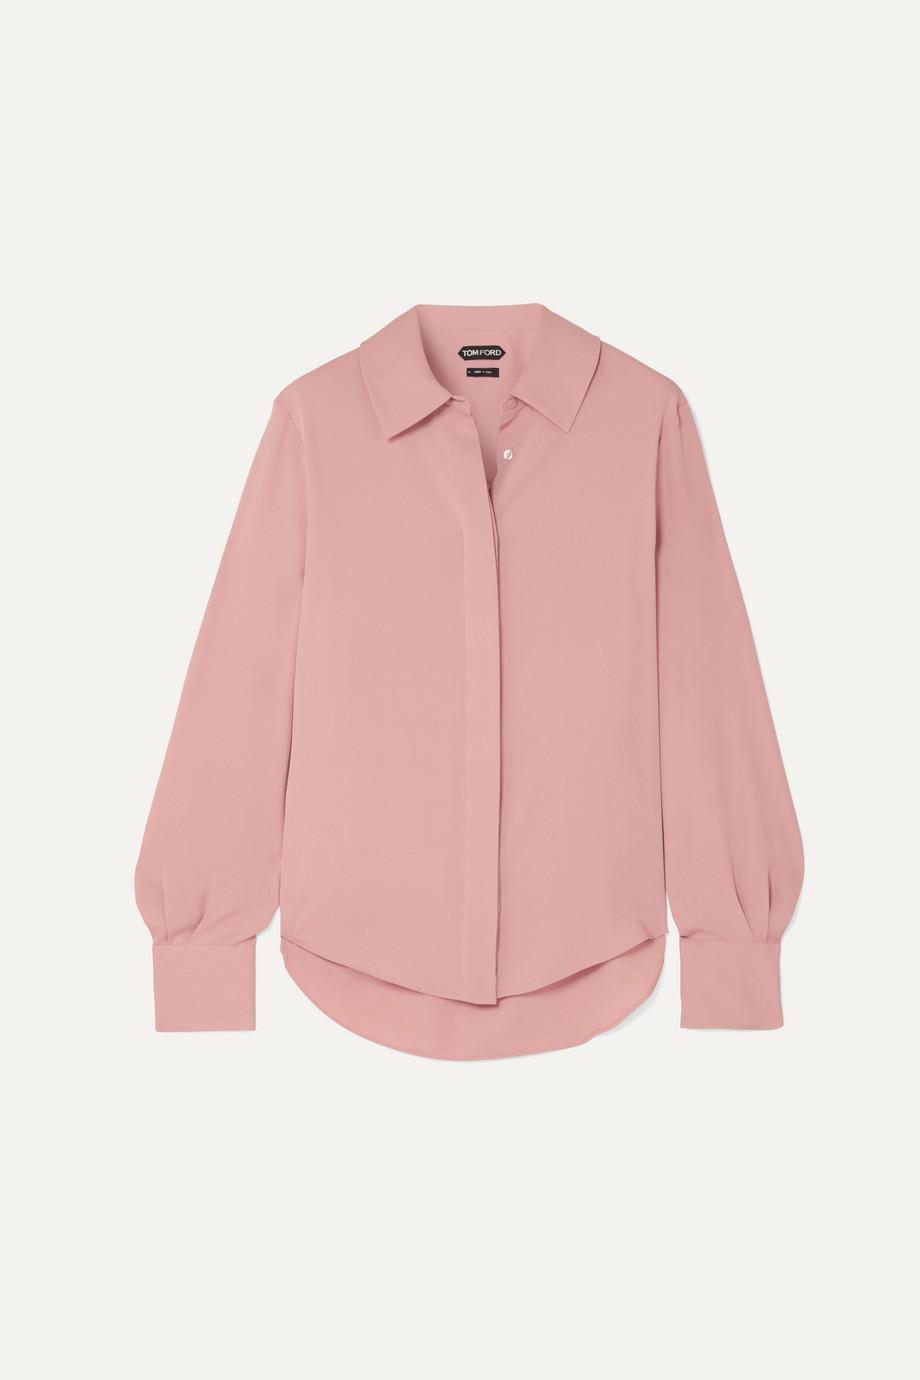 TOM FORD Silk crepe de chine blouse